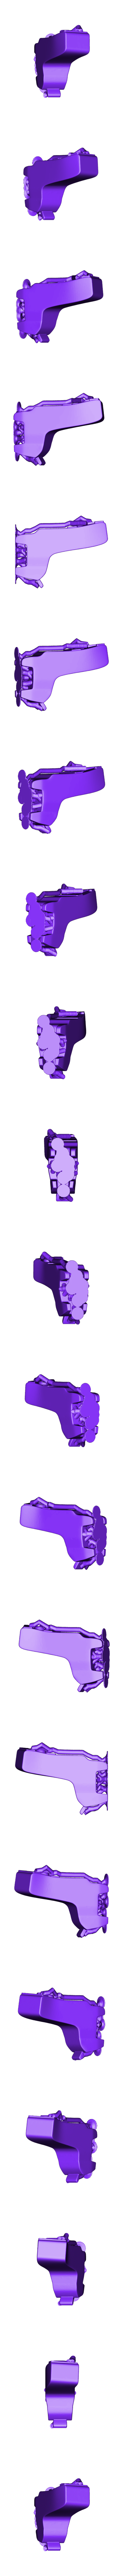 FLCL_2_supported.stl Download free STL file FLCL Dog  • 3D print object, Valello